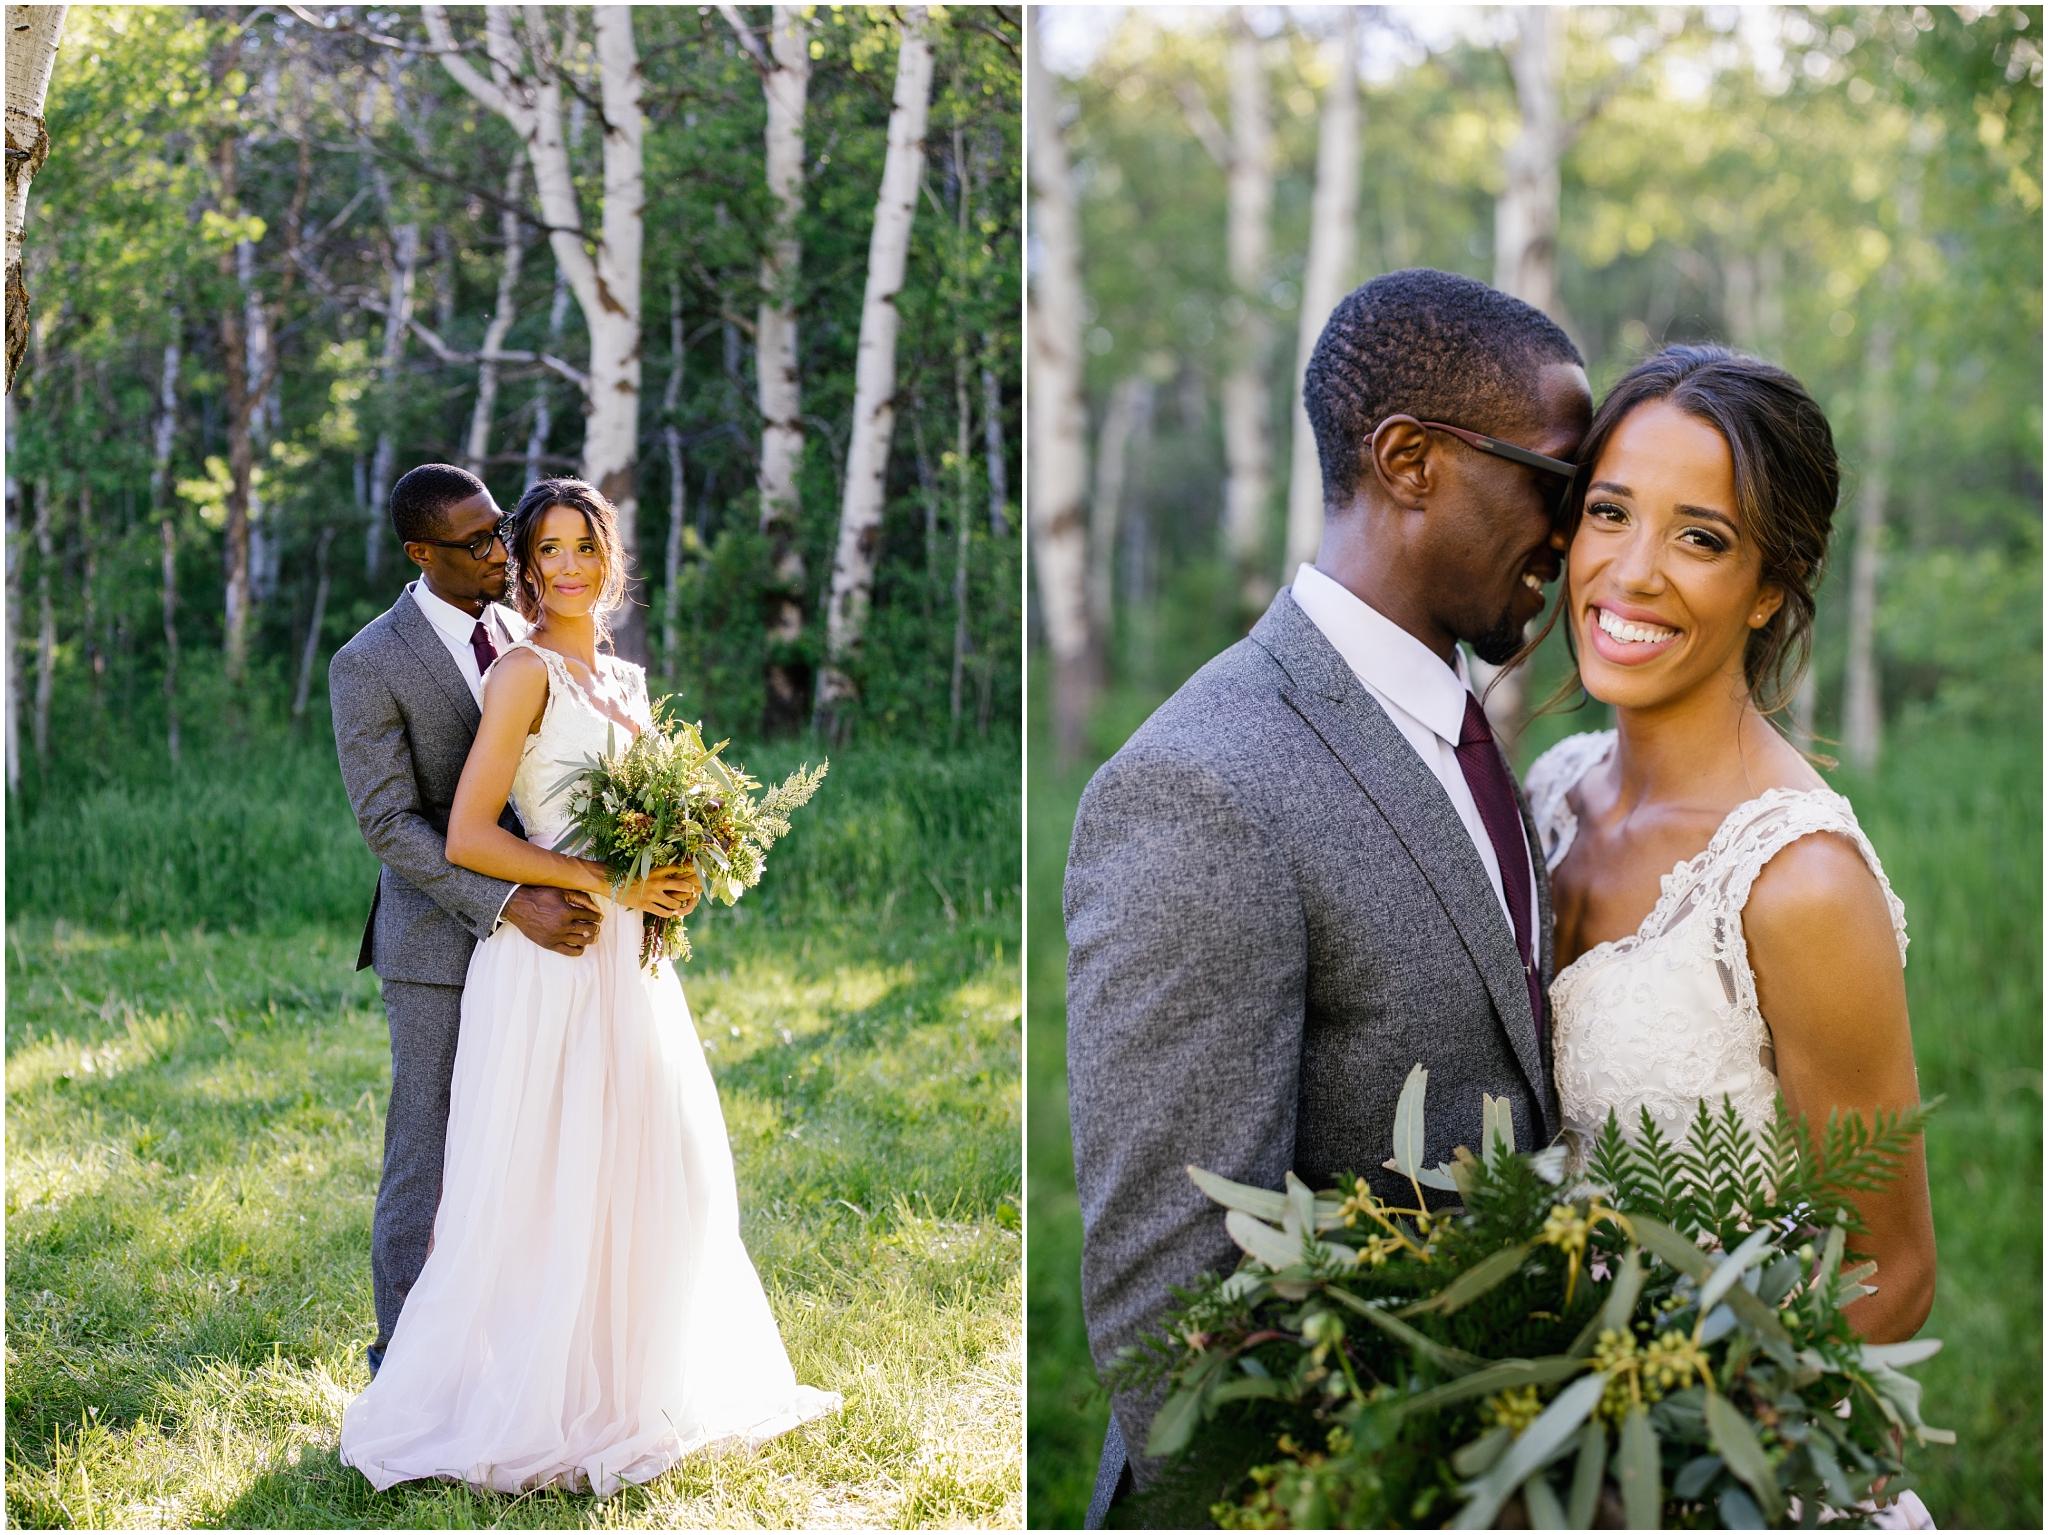 TreeHorseShoot-20_Lizzie-B-Imagery-Utah-Wedding-Photographer-Salt-Lake-City-Park-City-Oakley.jpg